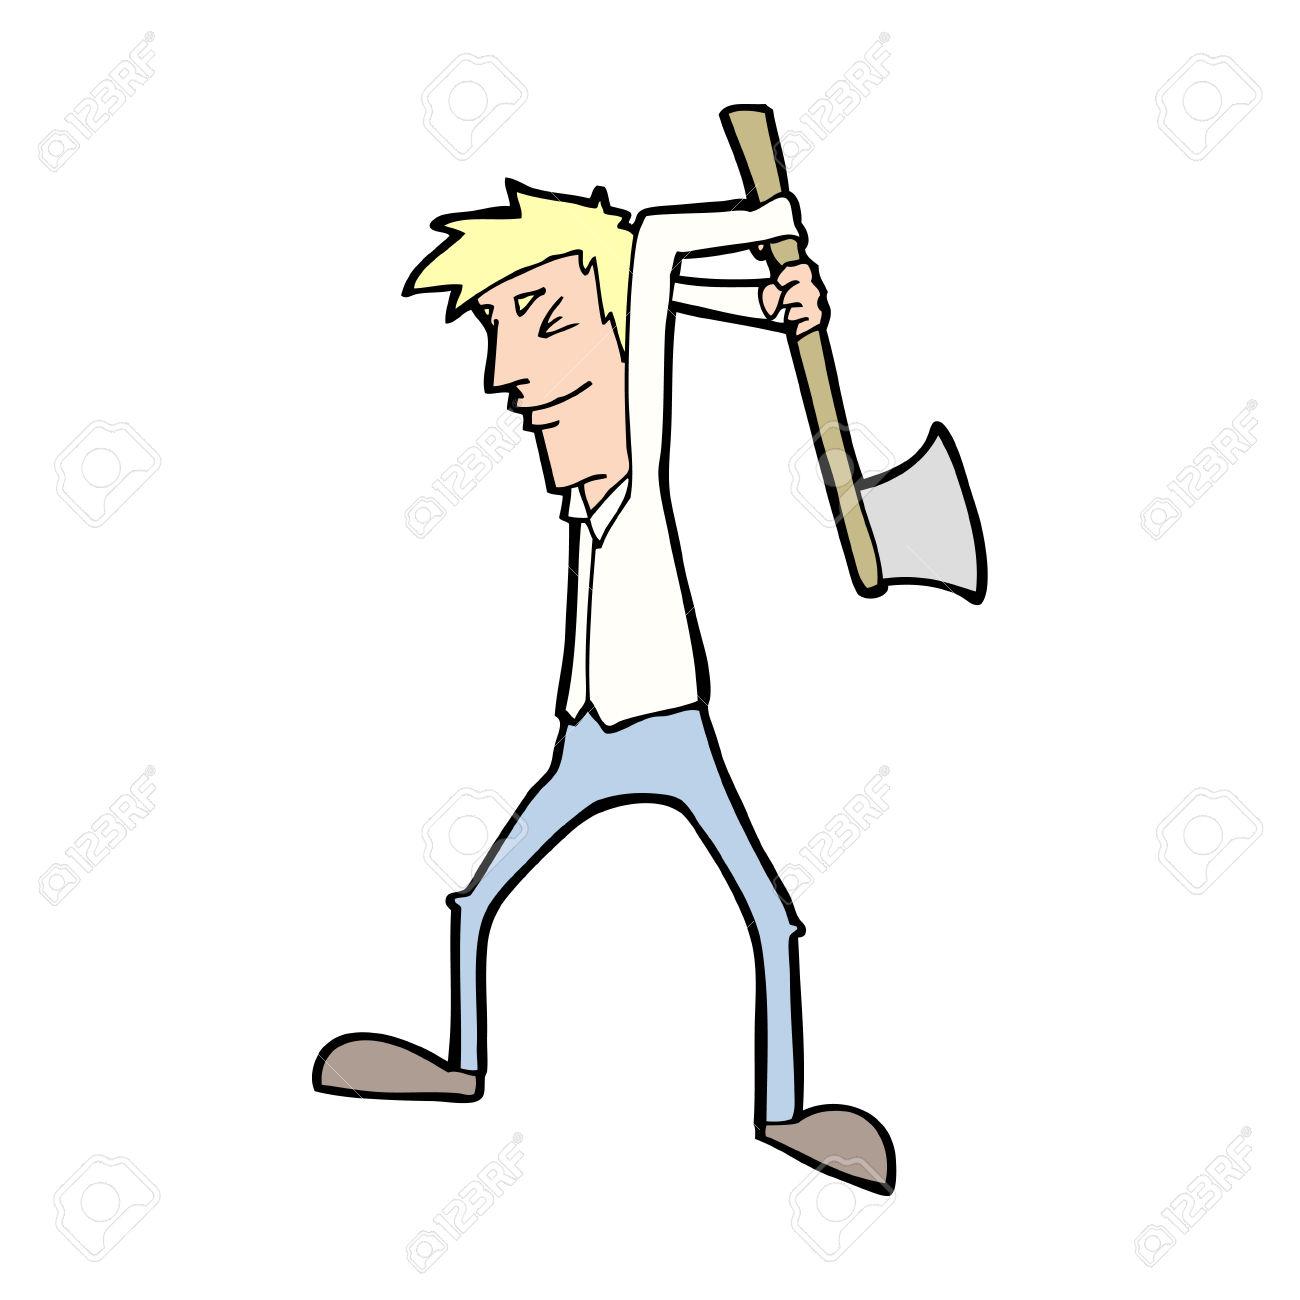 Ax clipart lumberjack axe. Man swinging at tree